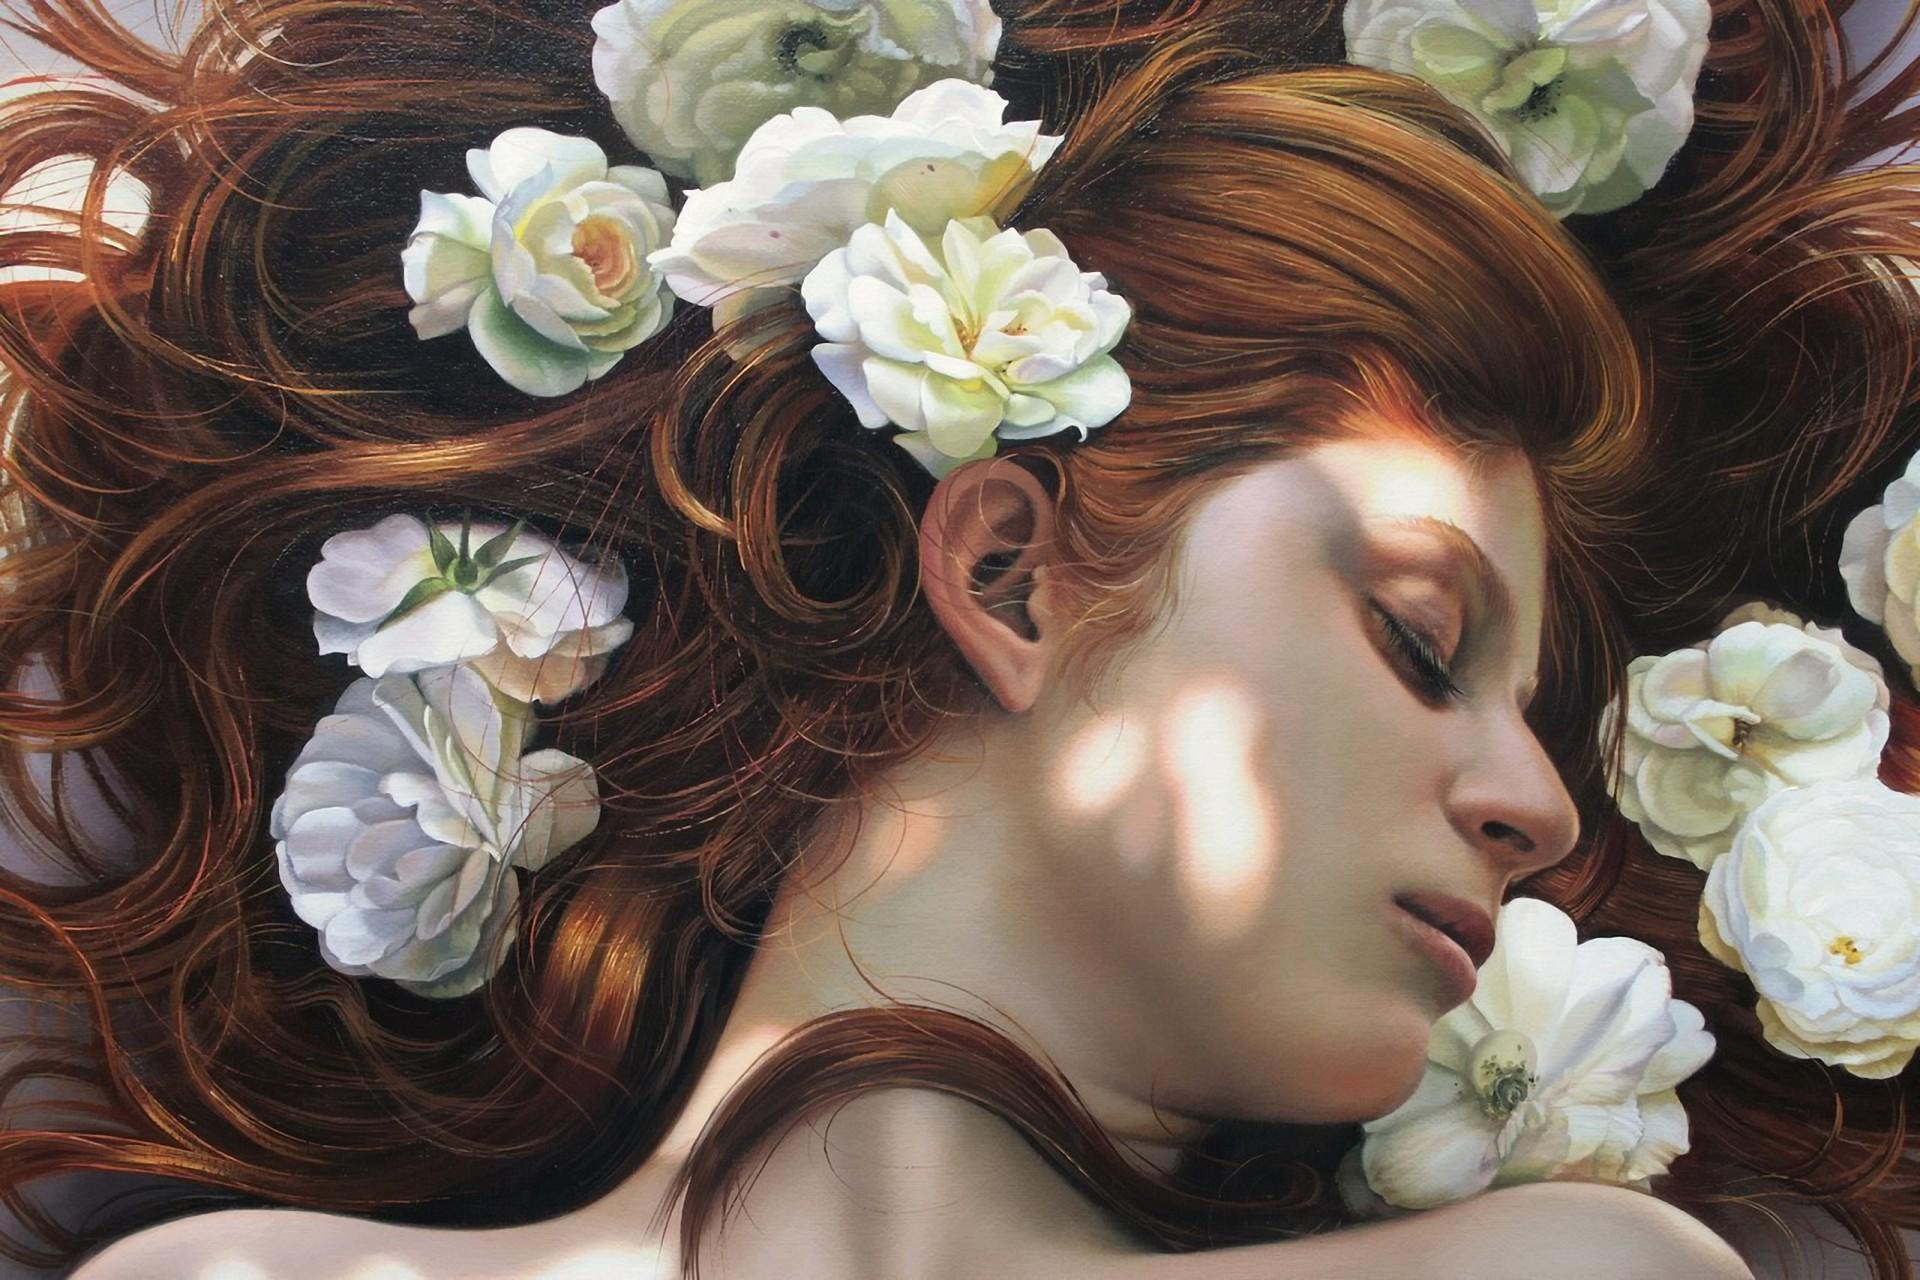 Wallpaper face women redhead artwork hair clothing ART 1920x1280